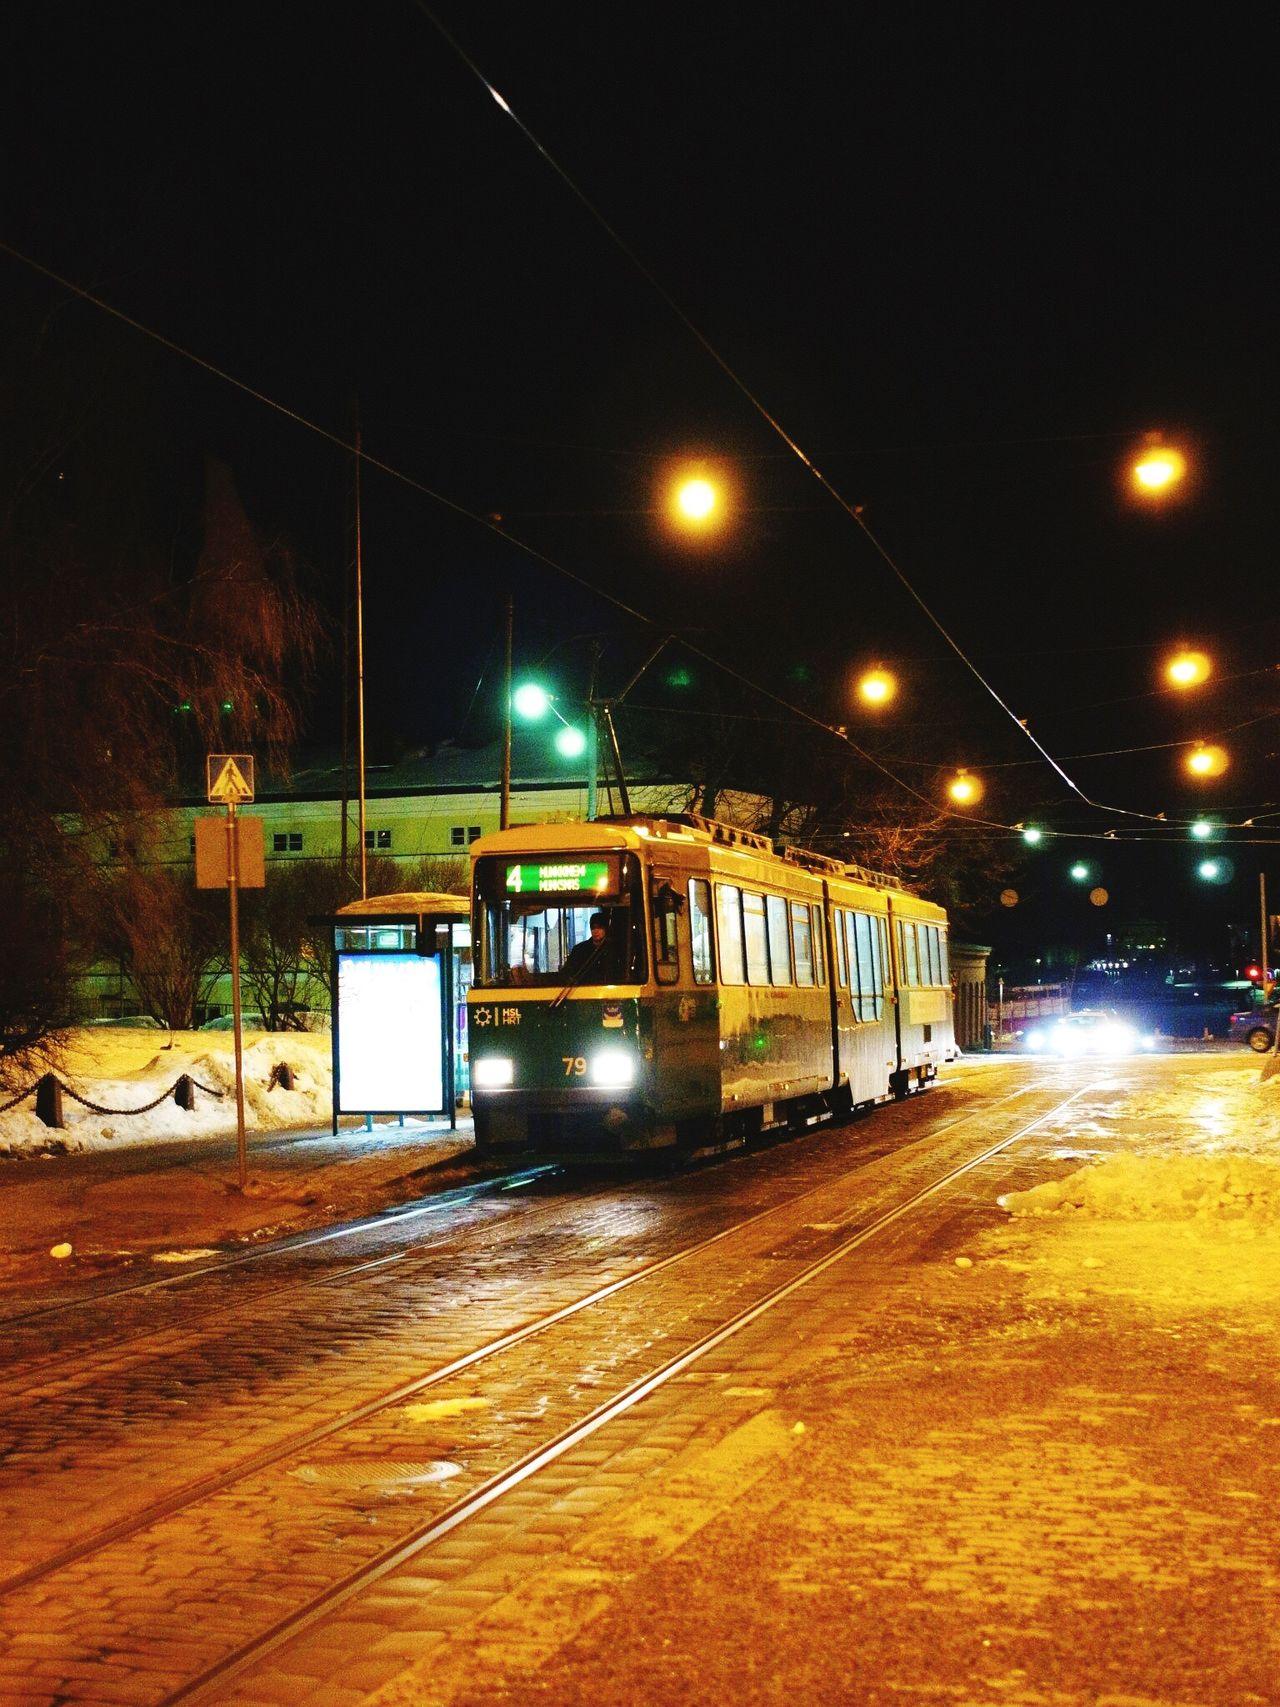 Transportation Illuminated Mode Of Transport Night Public Transportation Railroad Track Rail Transportation Tram Land Vehicle Cable Car No People Outdoors Sky